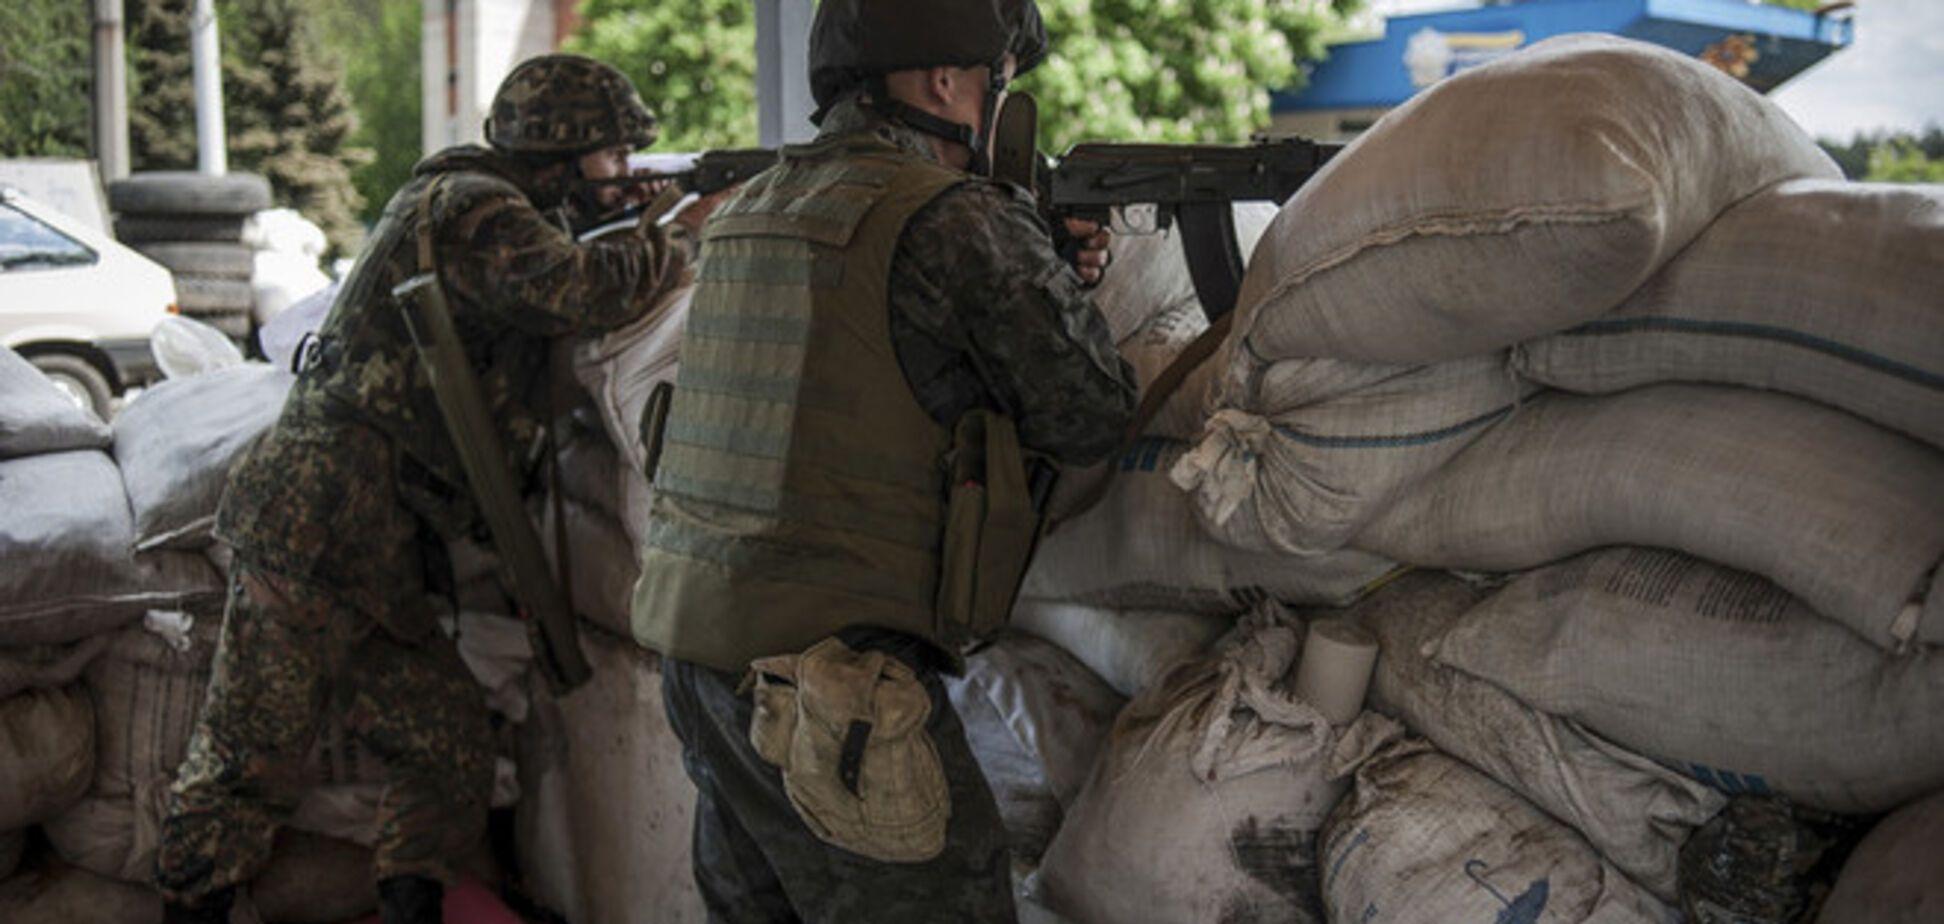 Минобороны отрицает применение артиллерии и минометов на границе с РФ